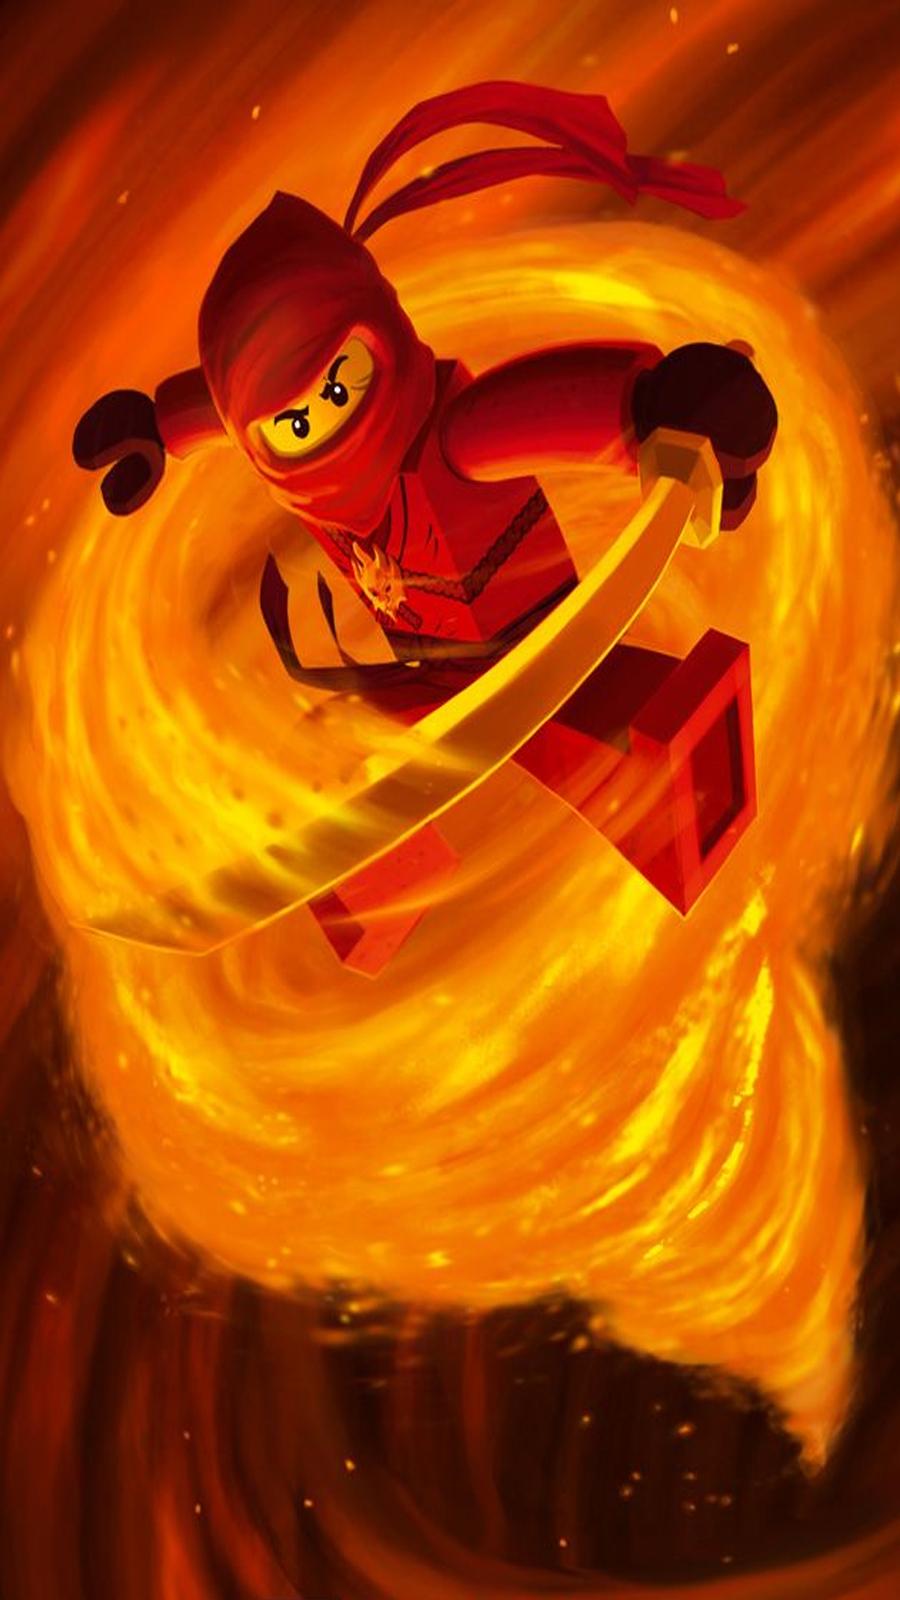 Ninjago Wallpaper – Lego Wallpapers Free Download